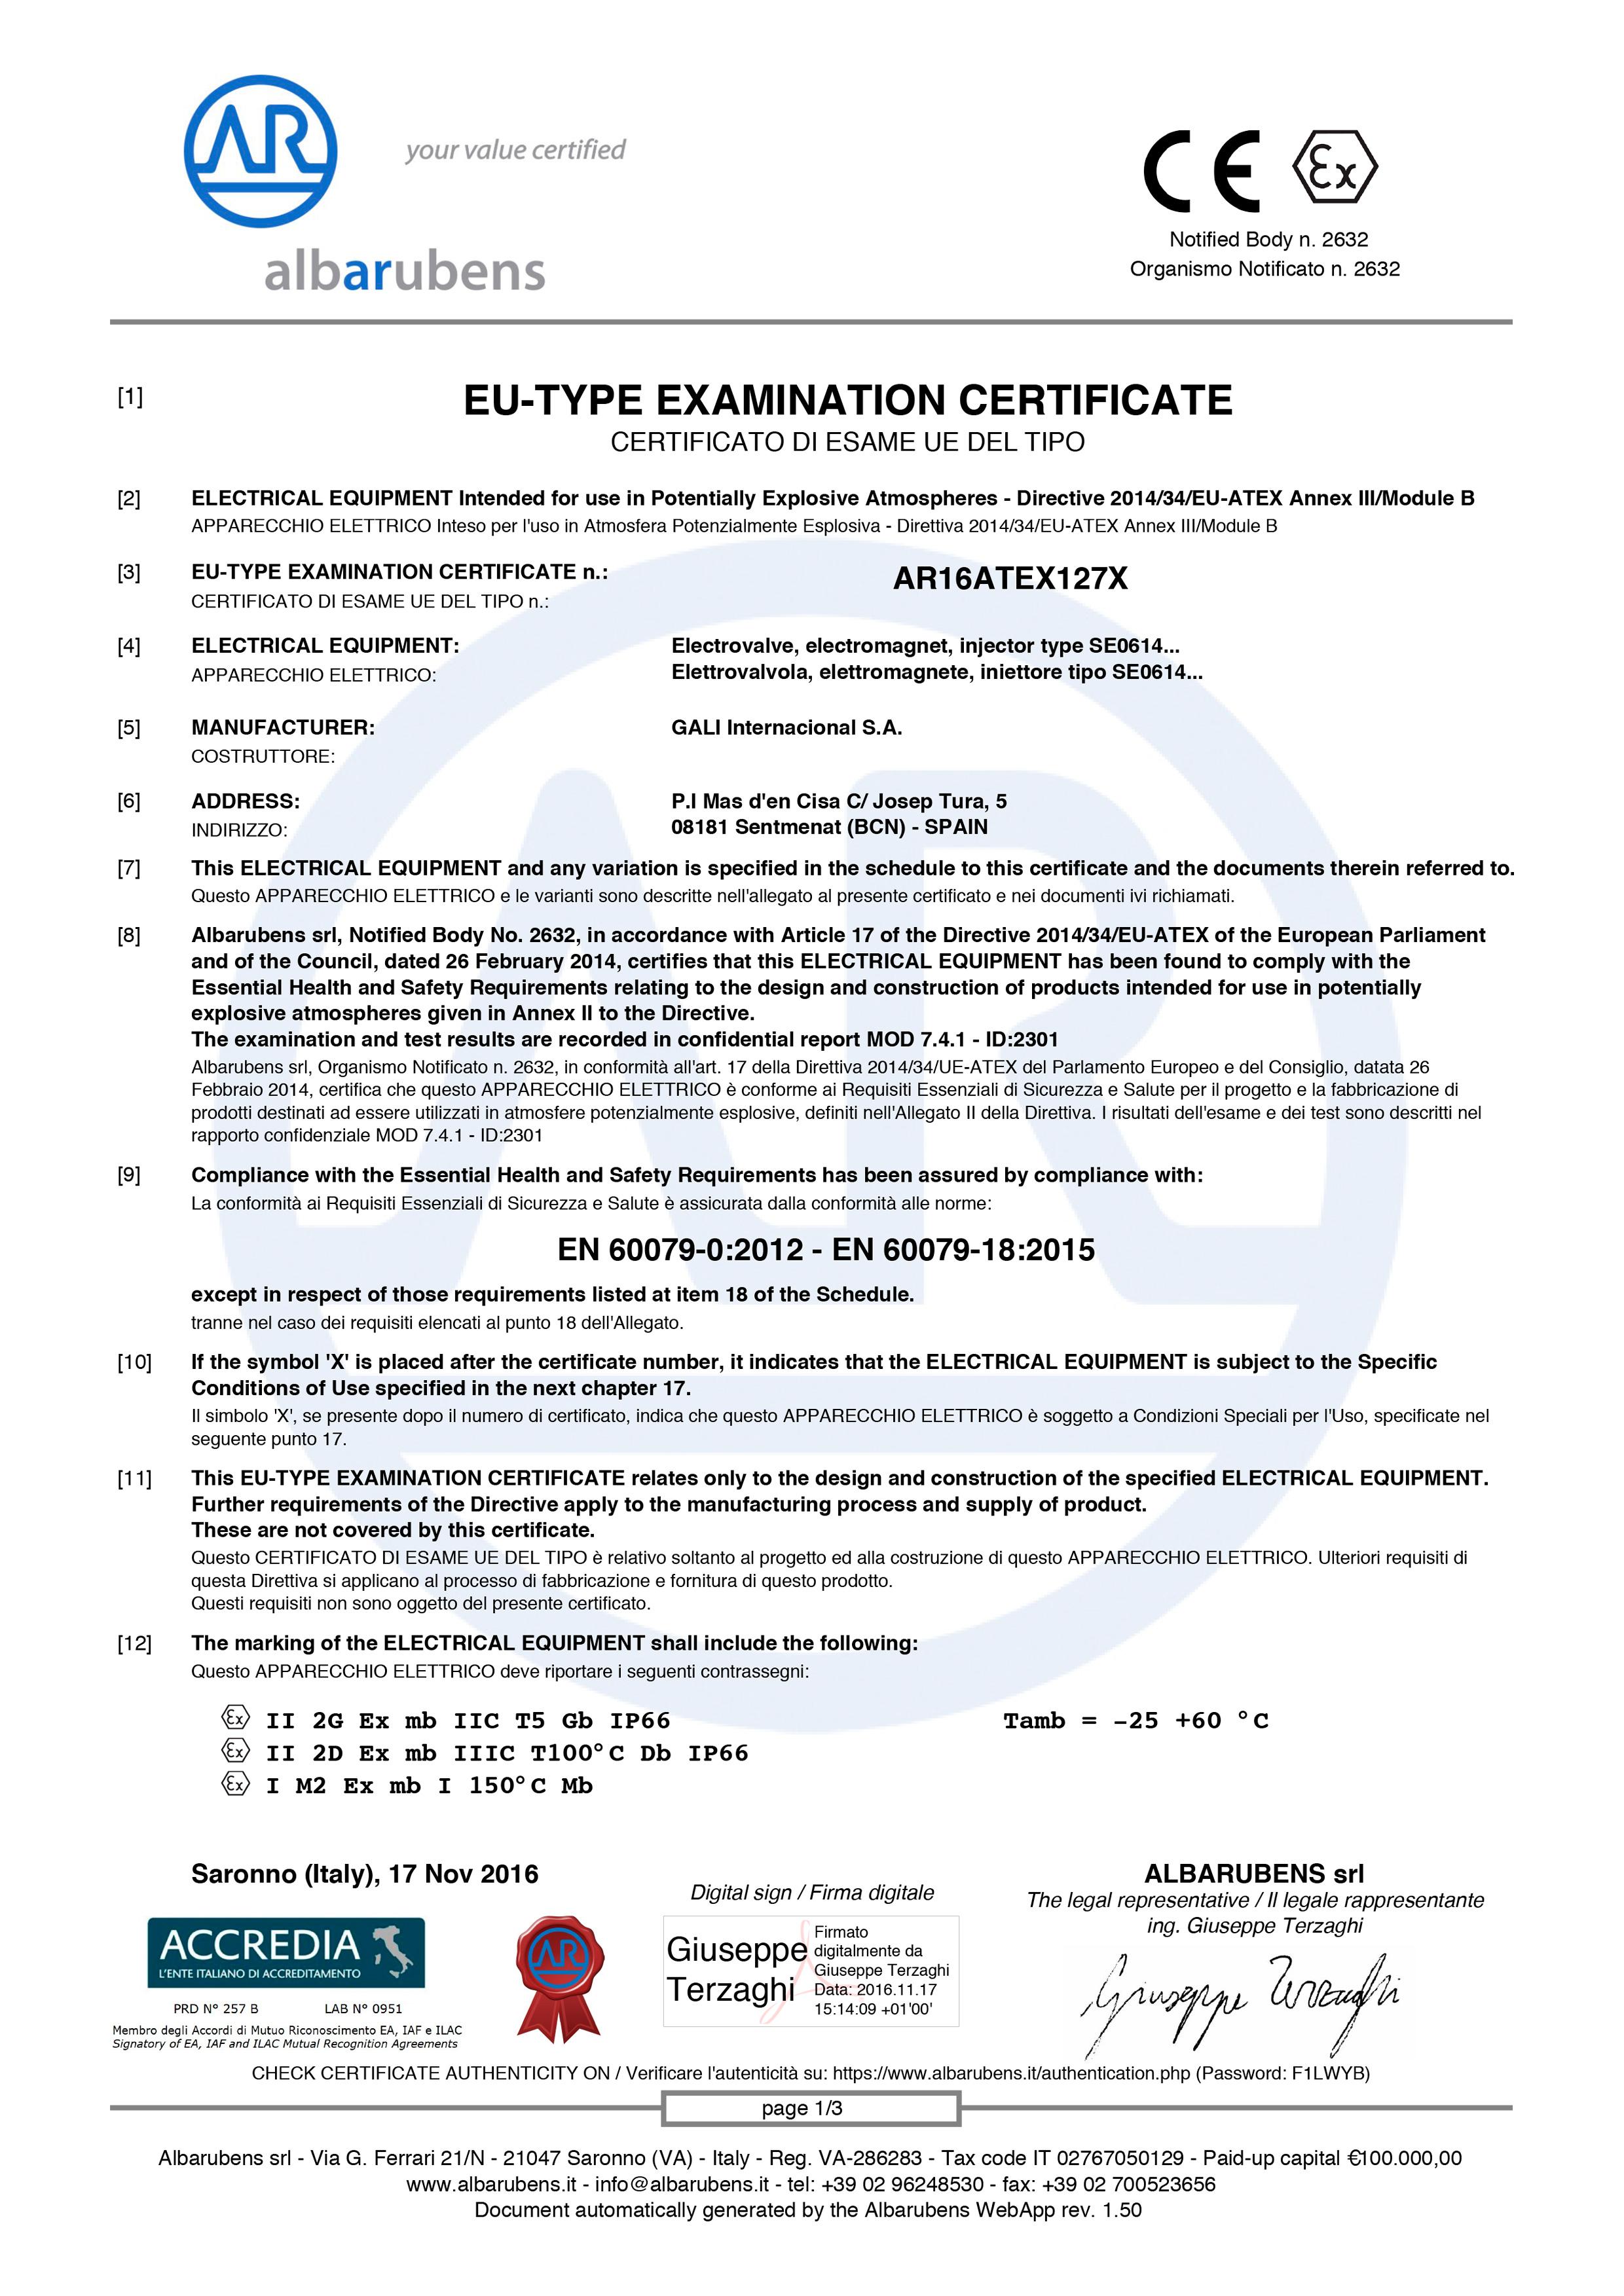 AR16ATEX127X-1 certificate